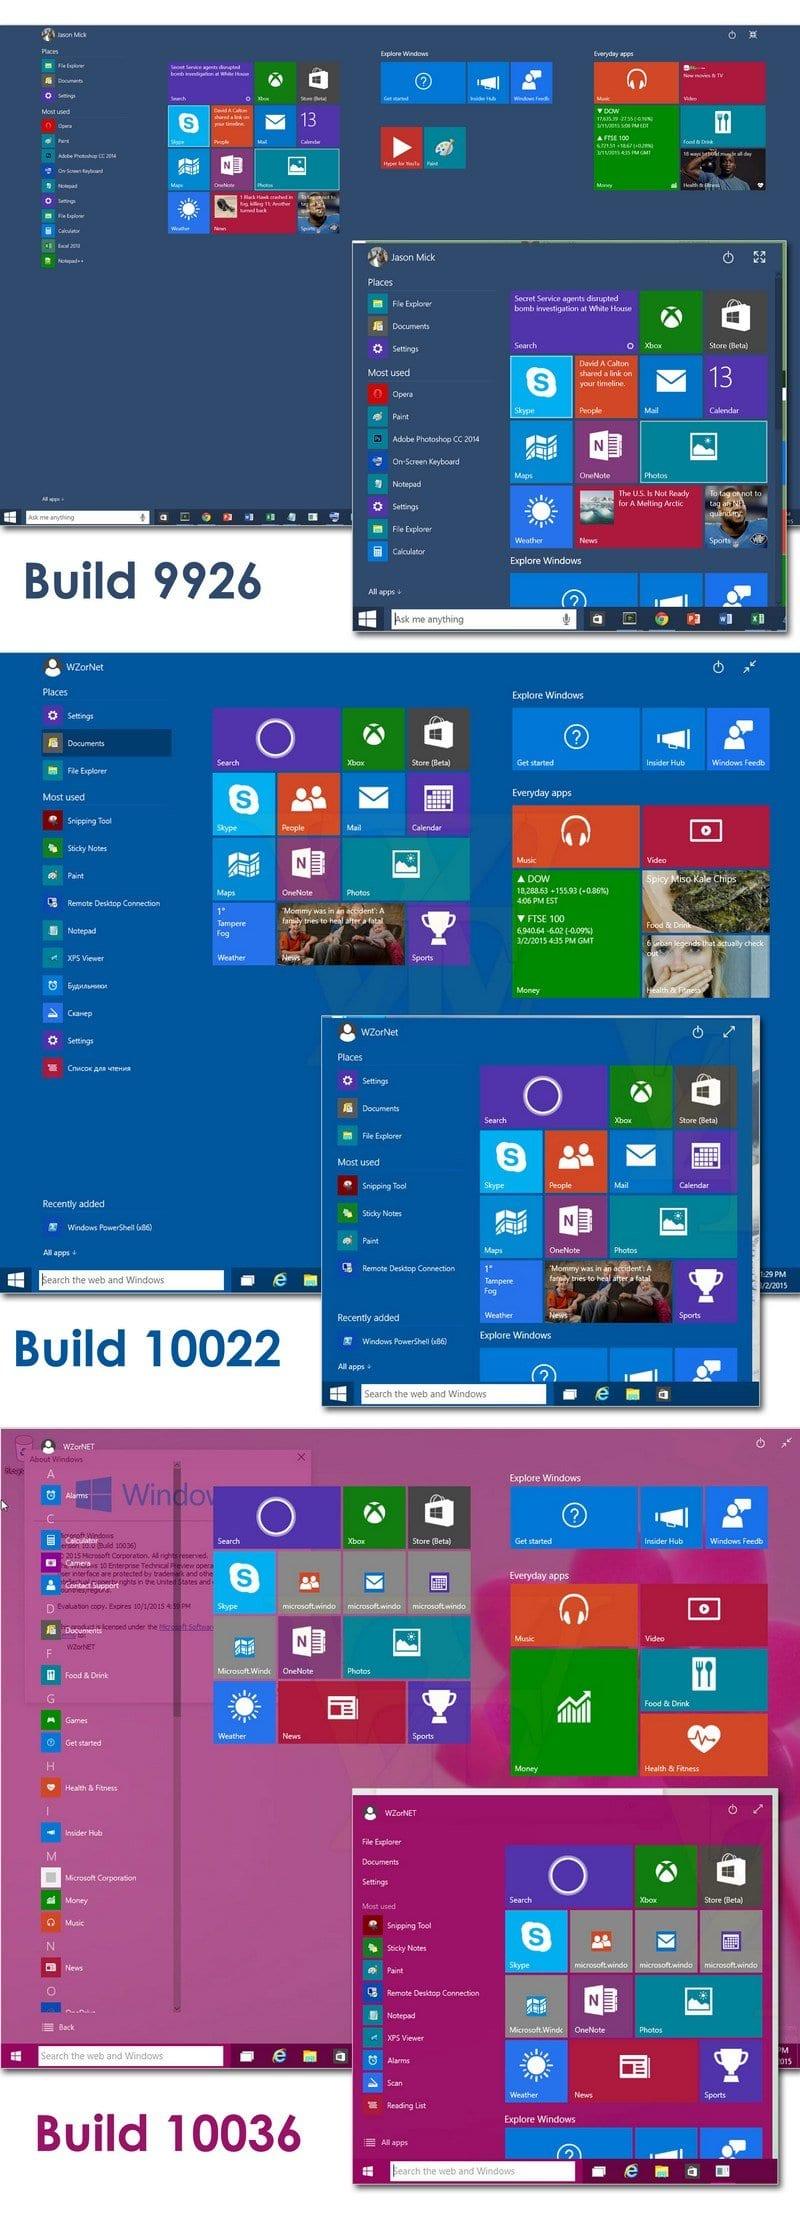 Comparison of Windows 10 Start Menu in different builds